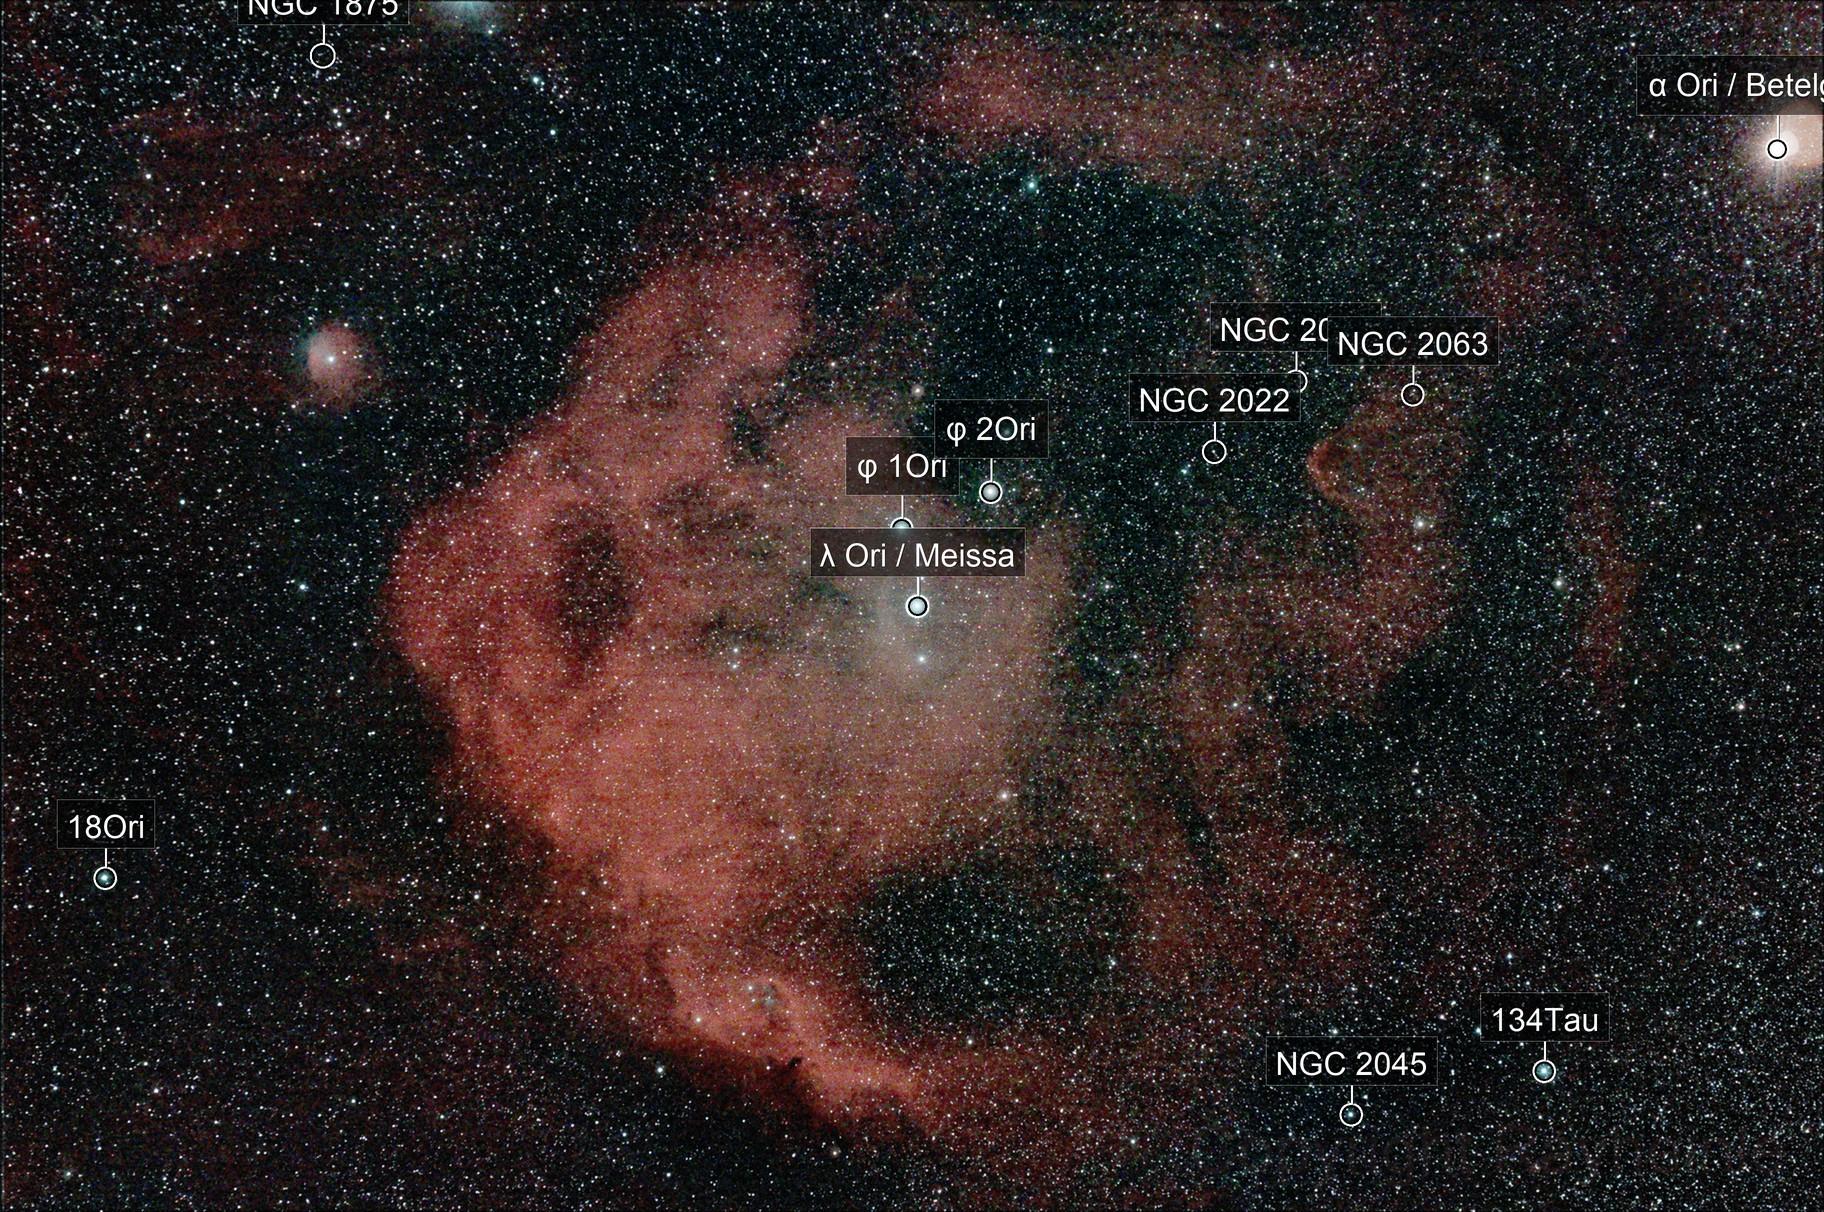 Head of Orion (Meissa Nebula)